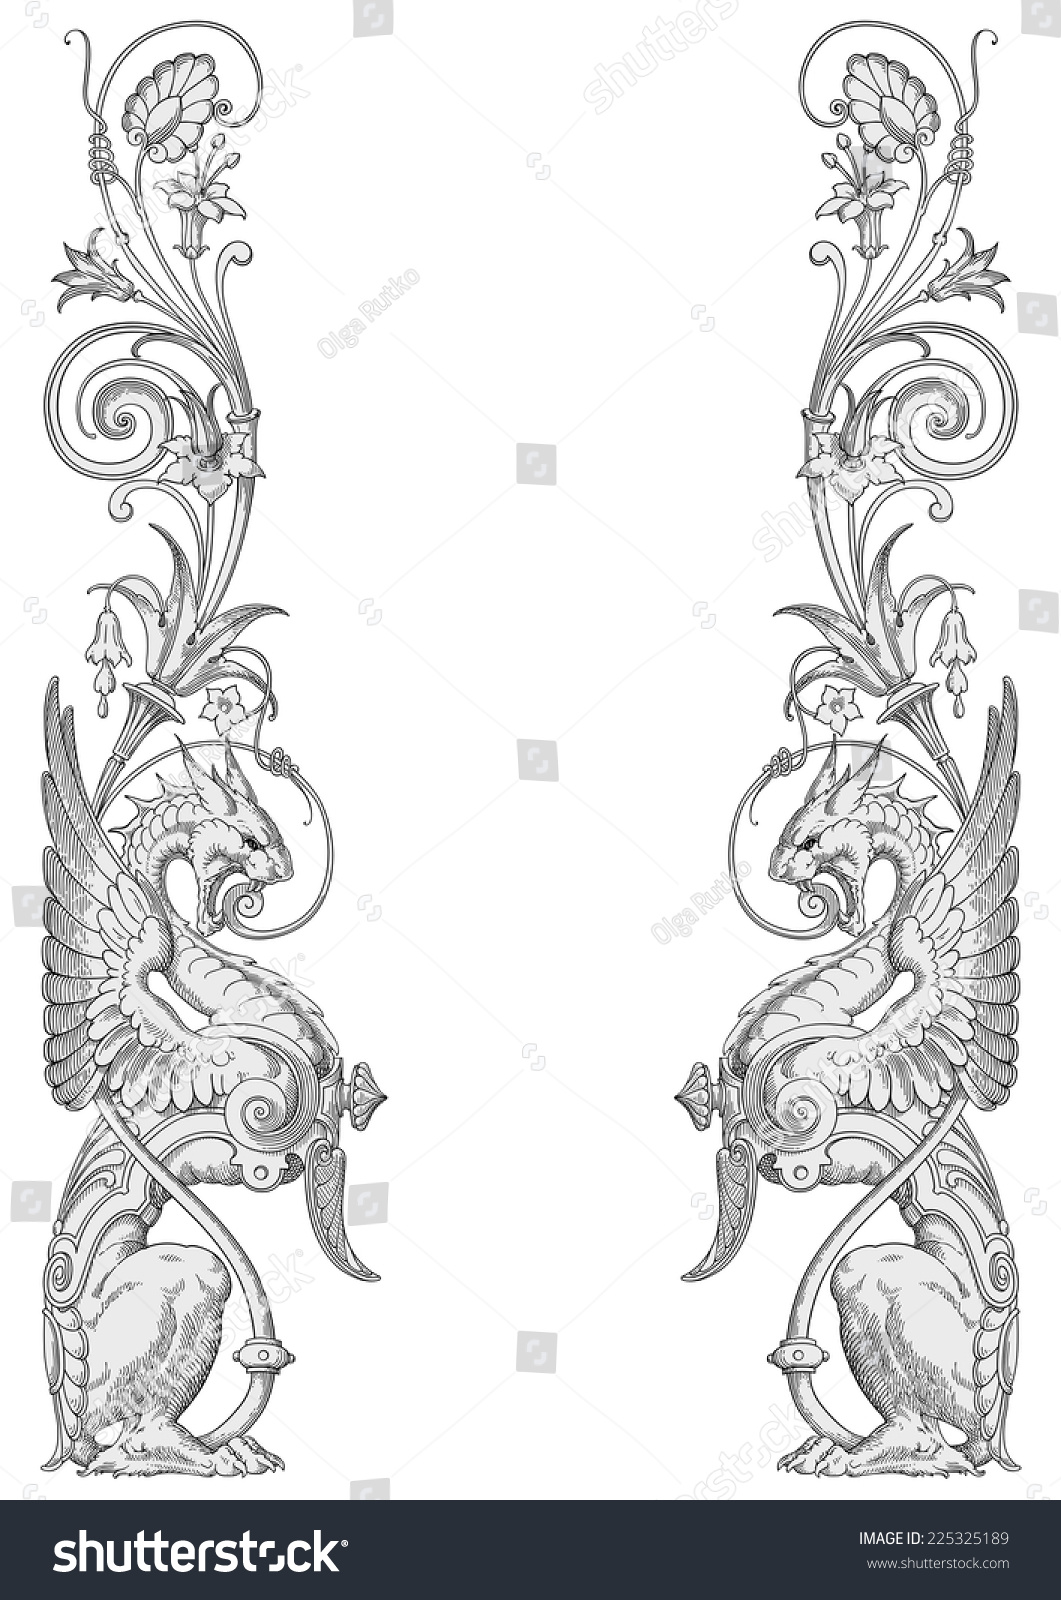 dragons frame vector - Dragon Frame